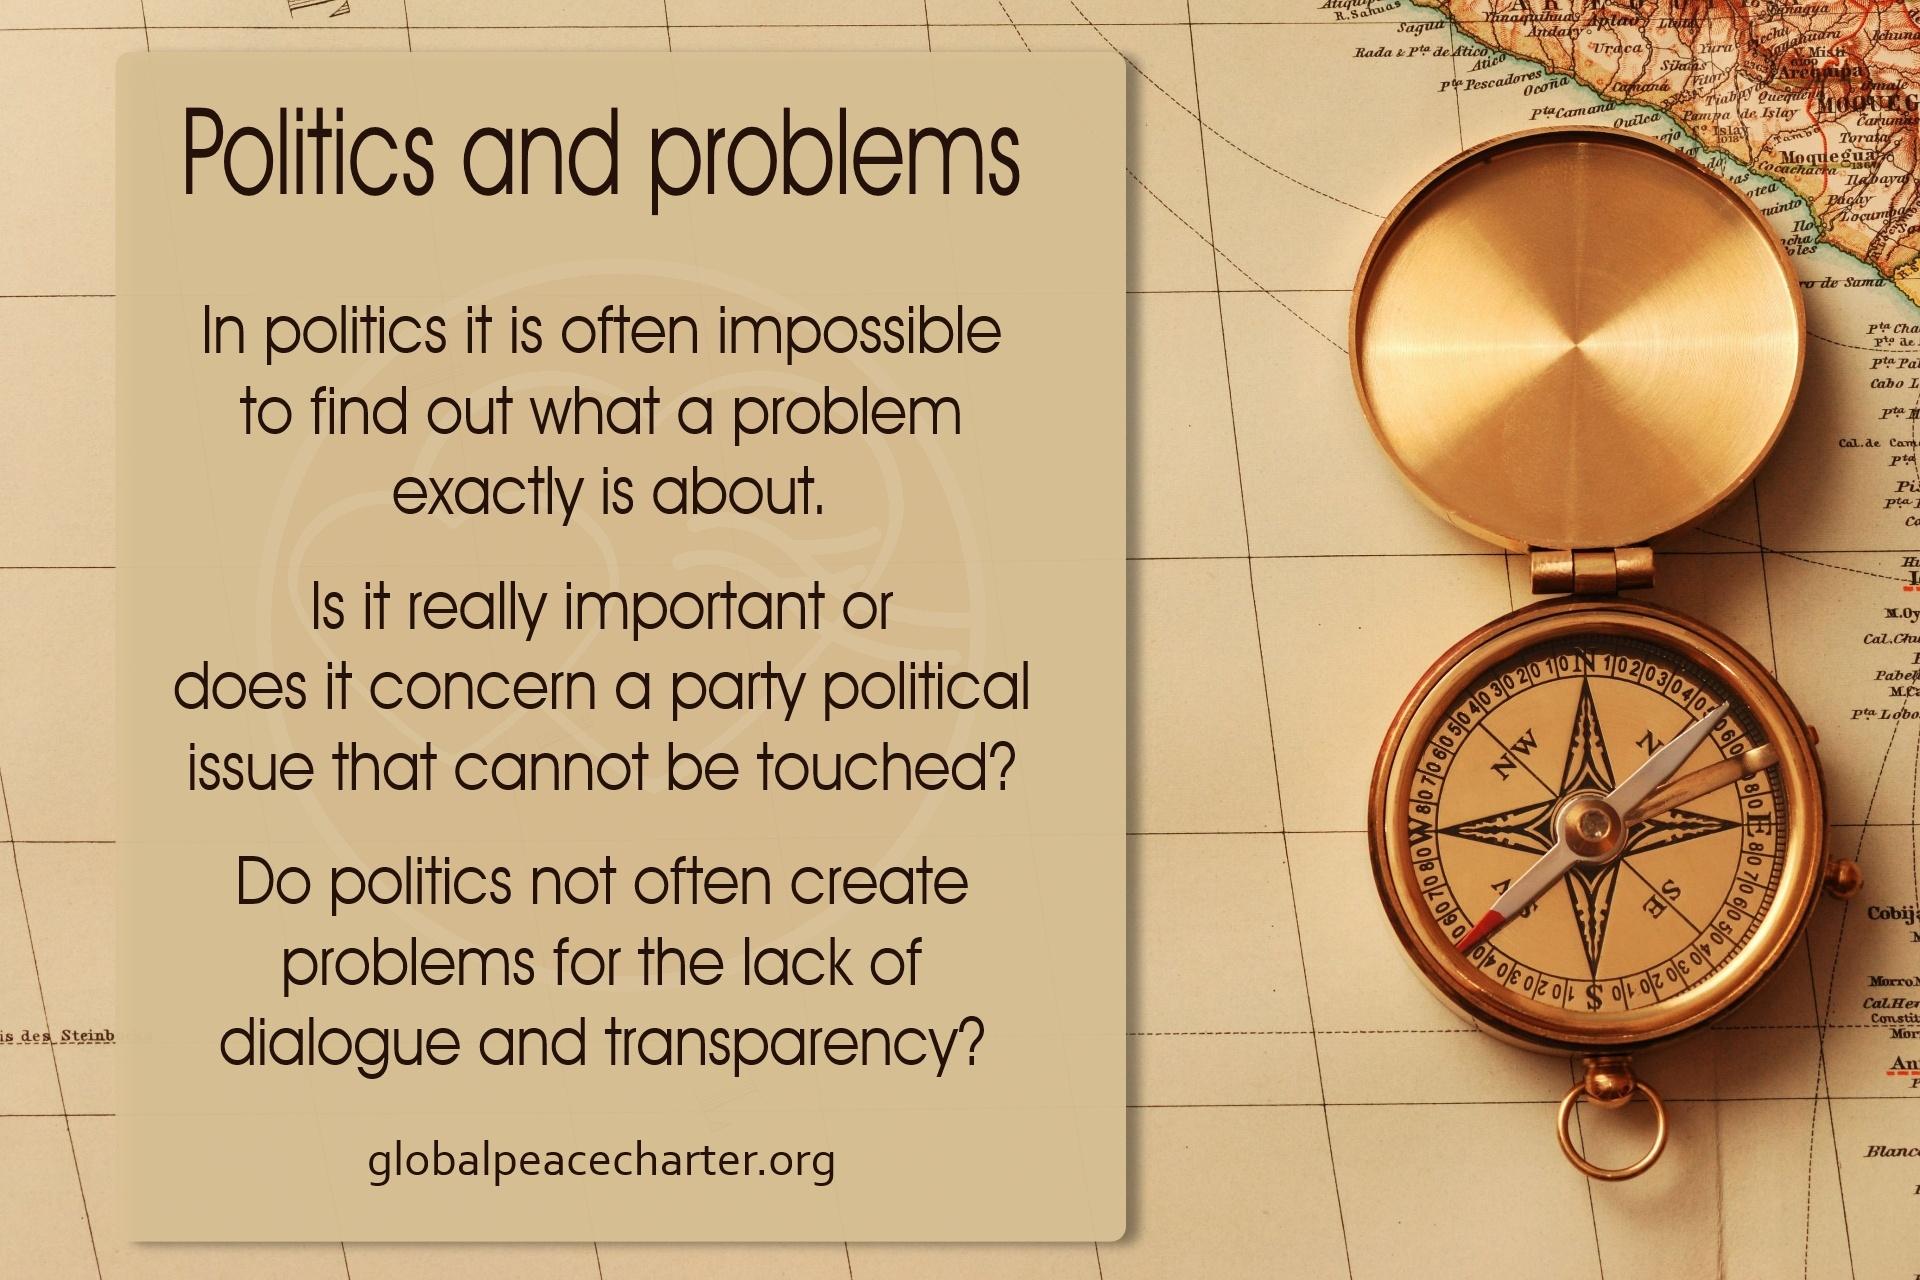 Politics and problems